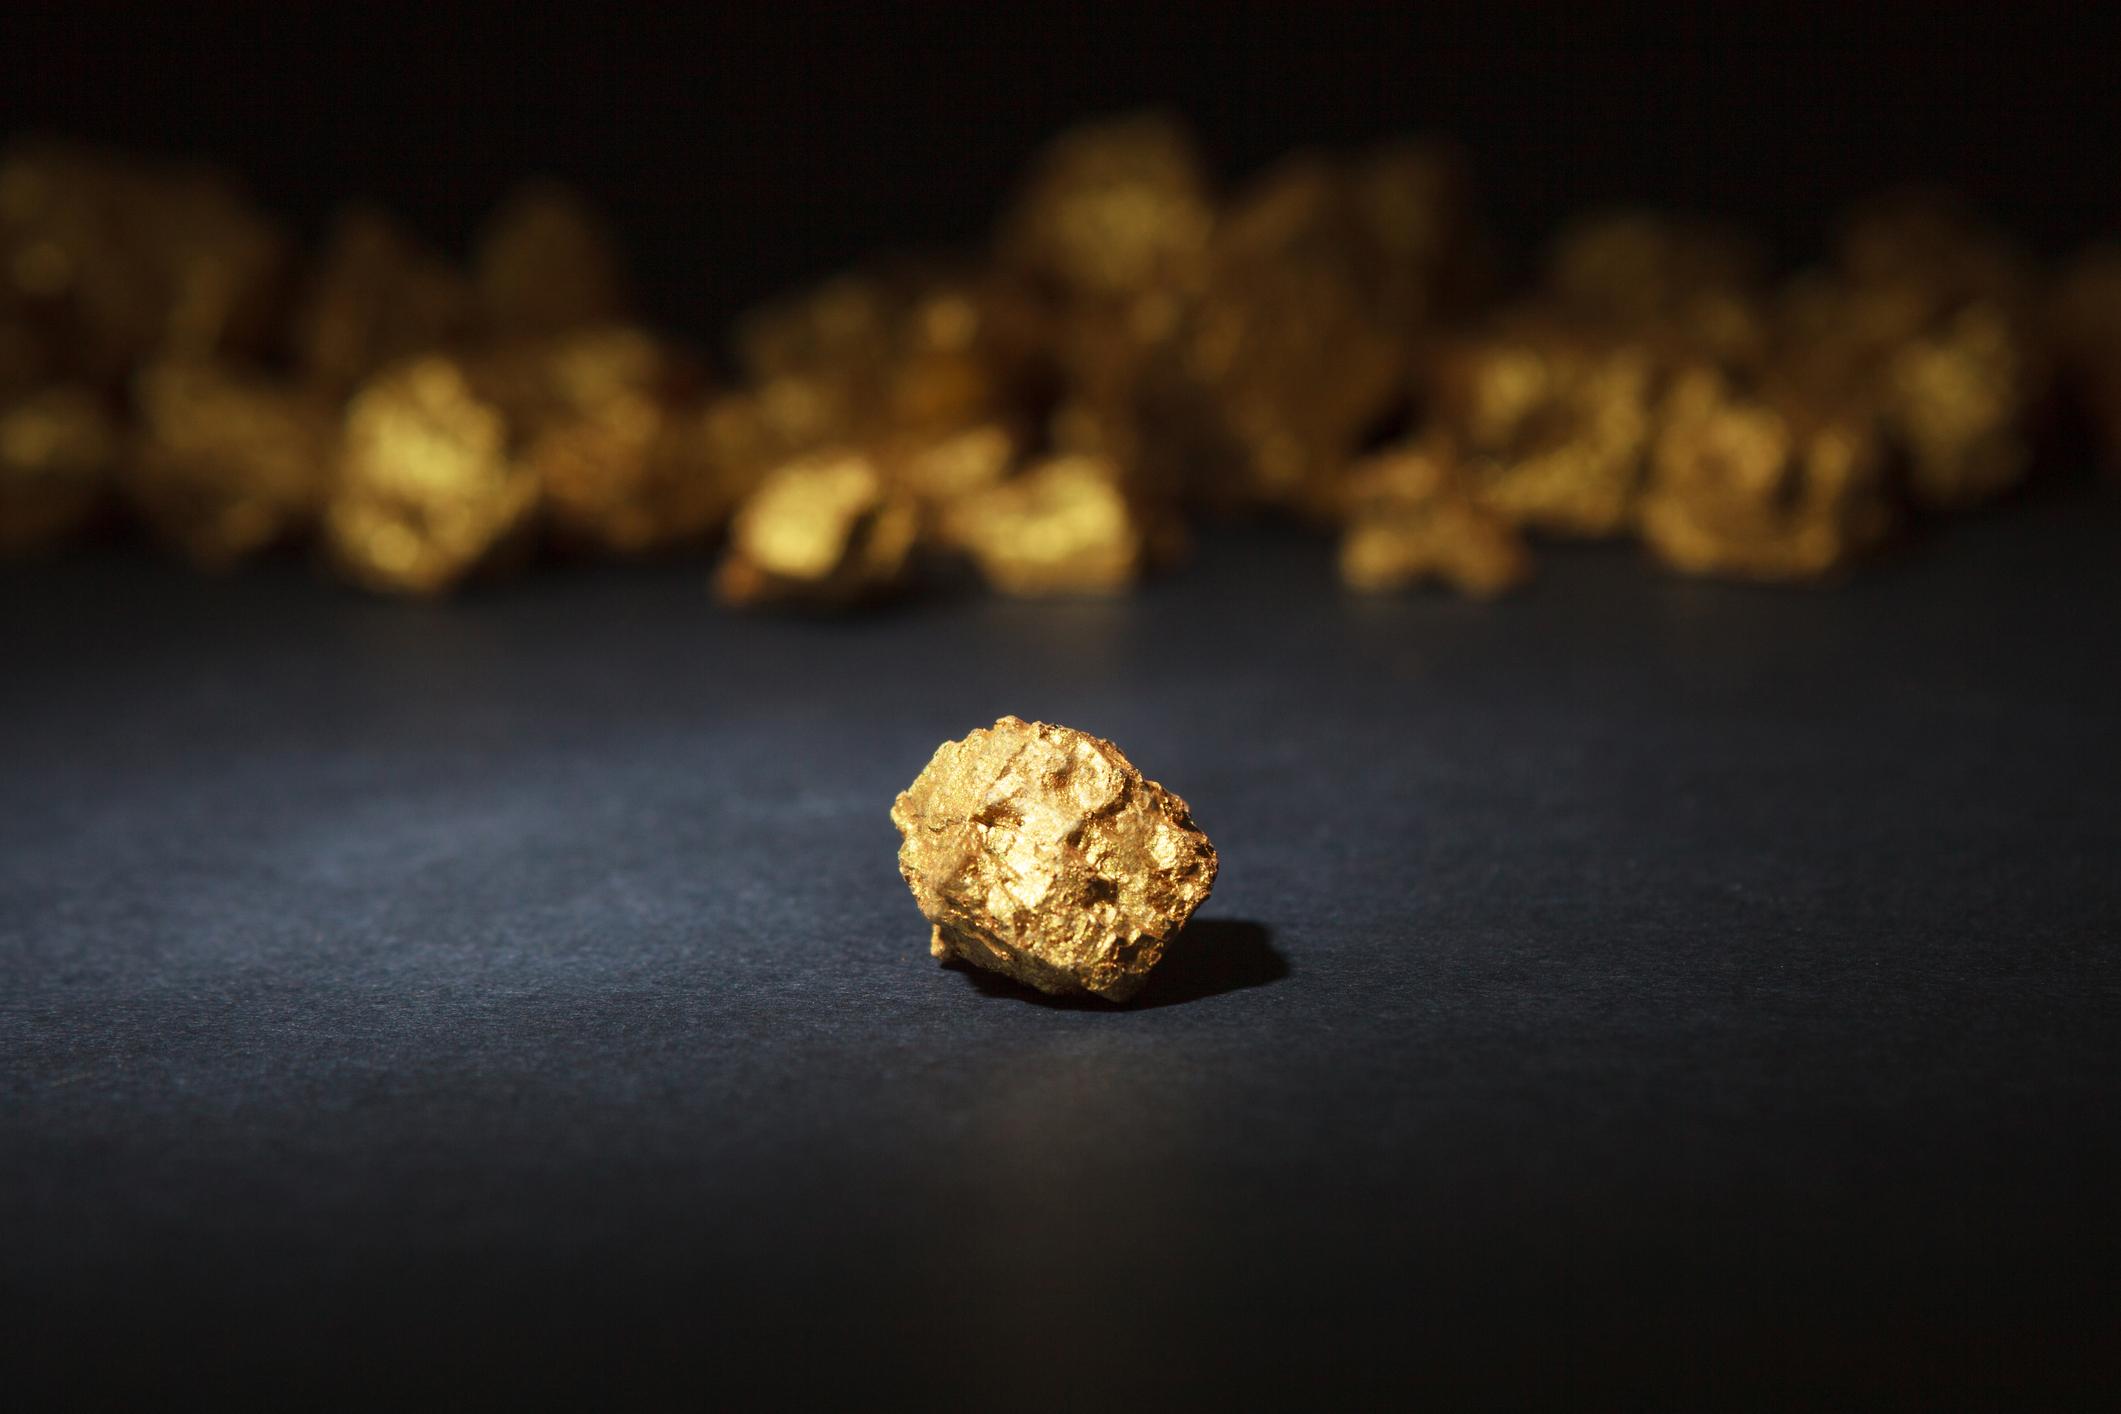 Golden nuggets.